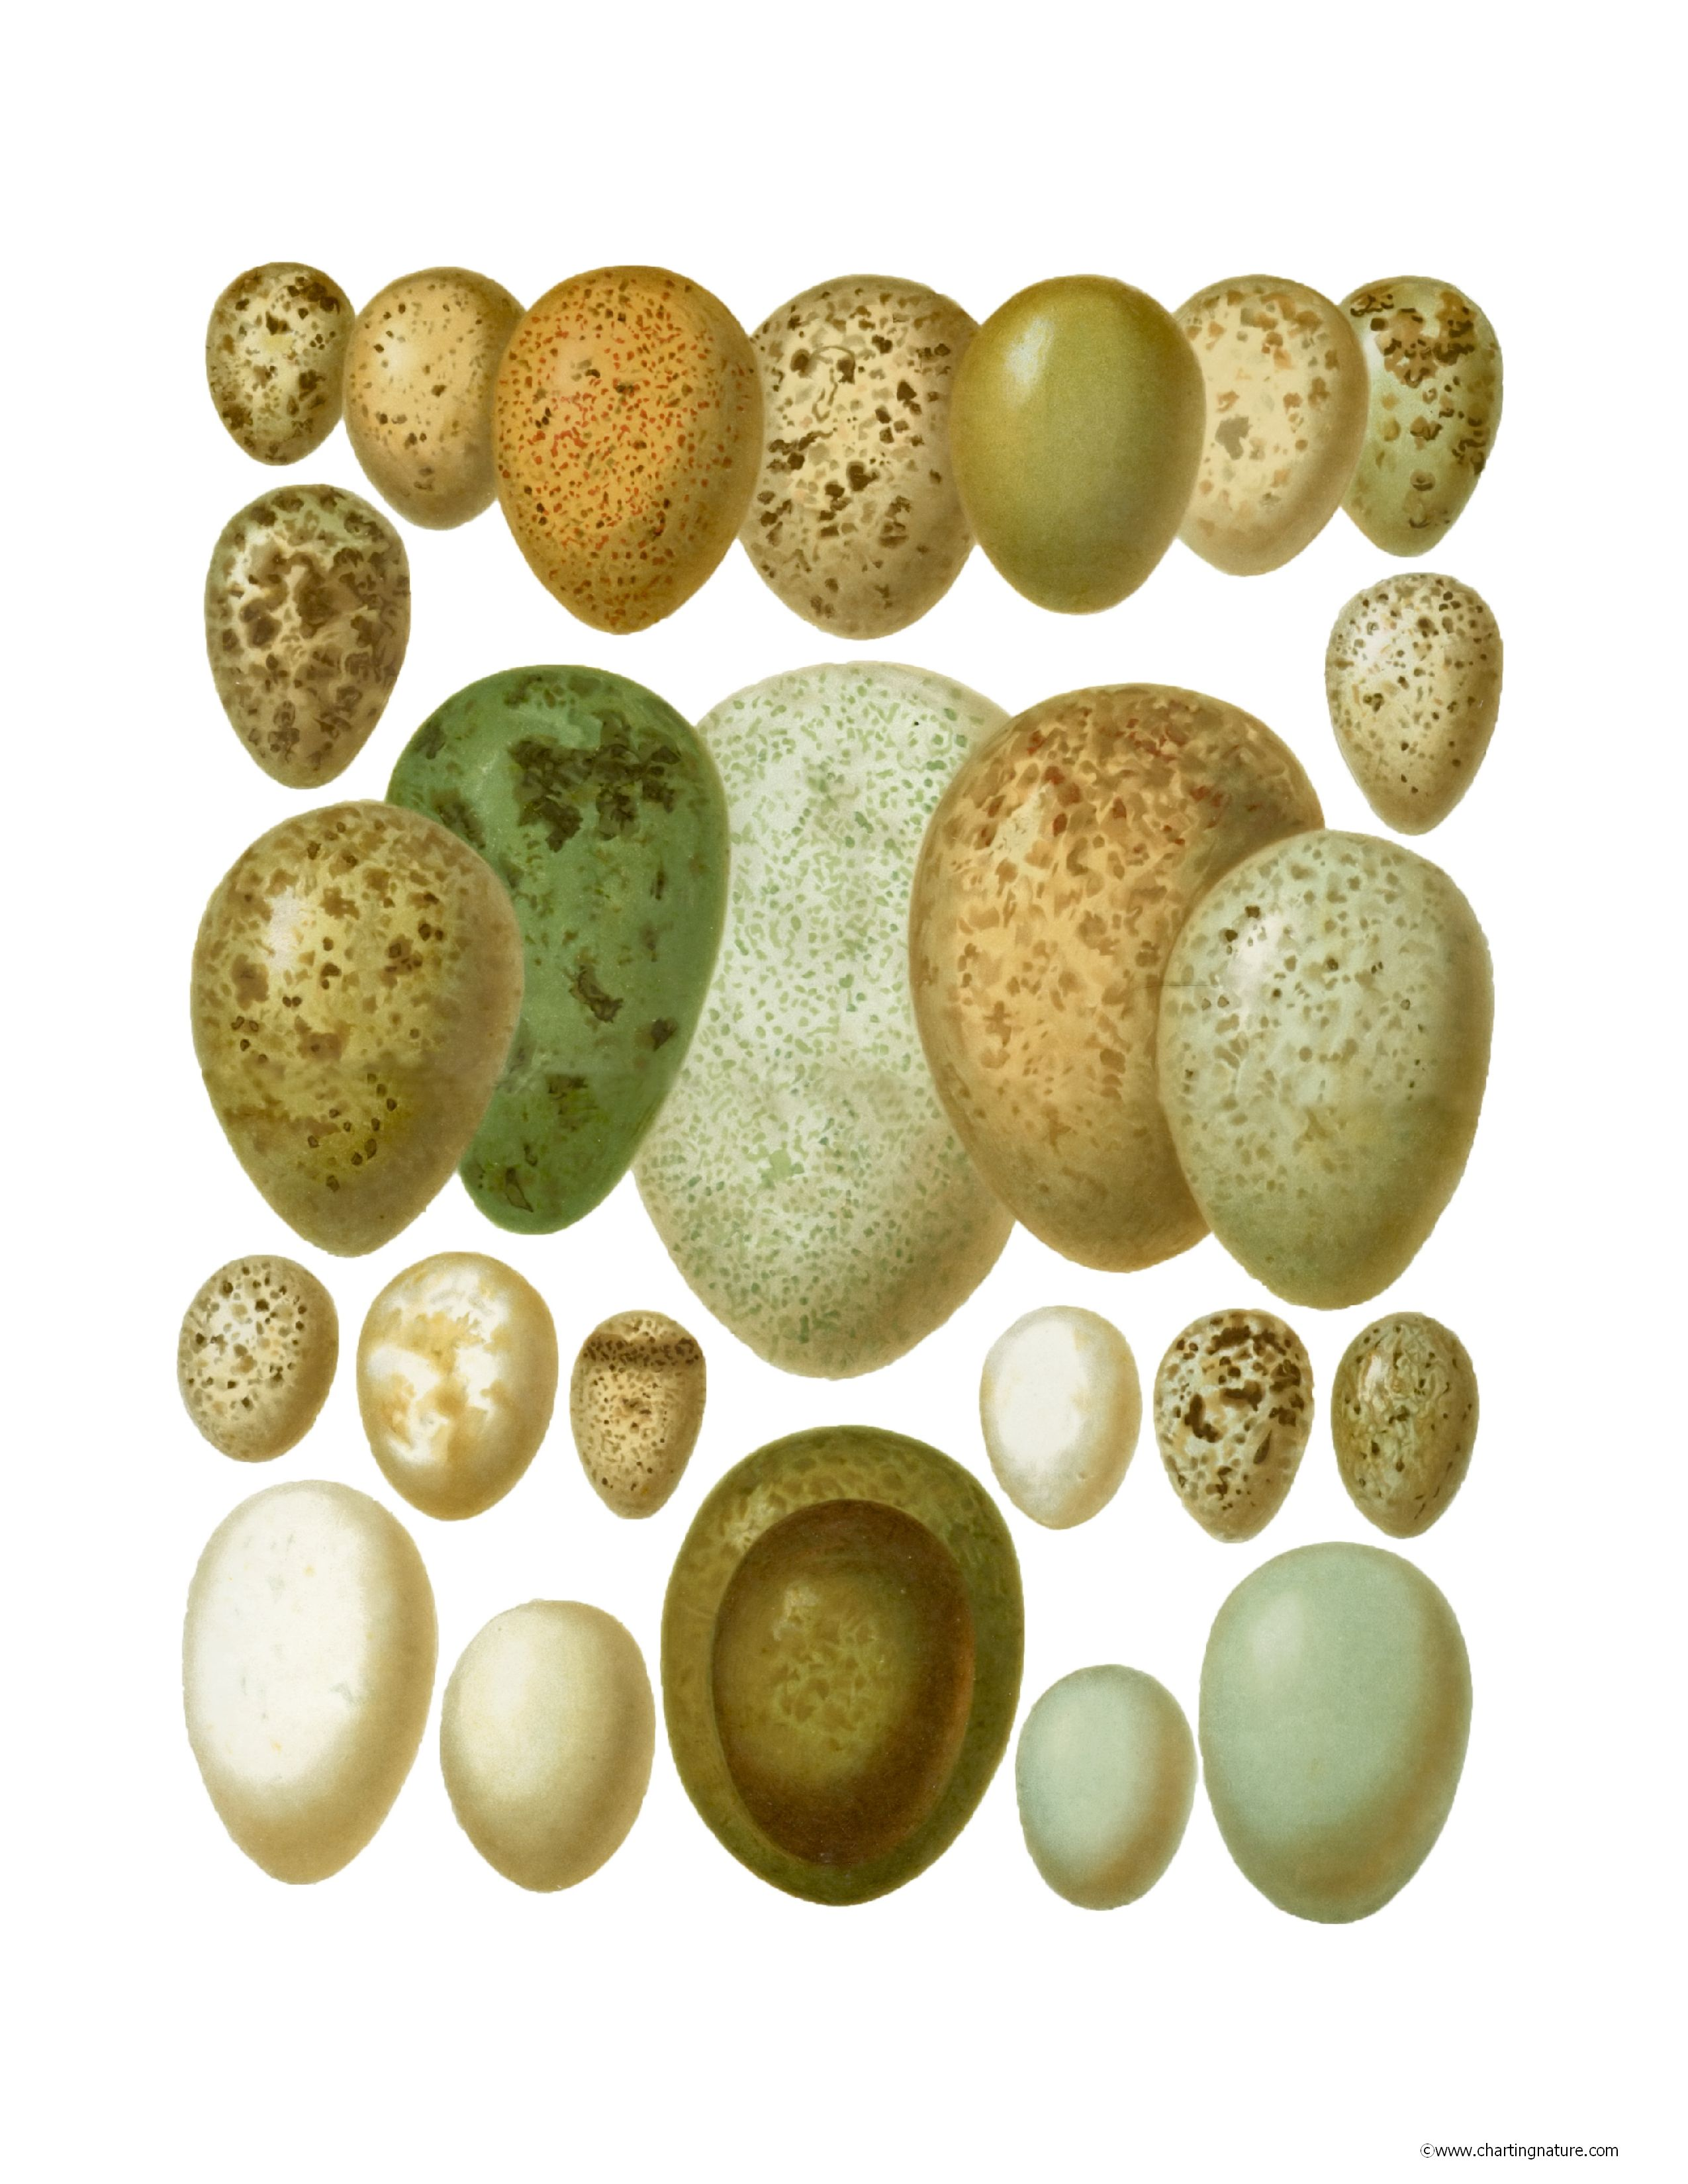 Bird Eggs | Charting Nature - Vintage Botanical, Fish and Wild Bird ...